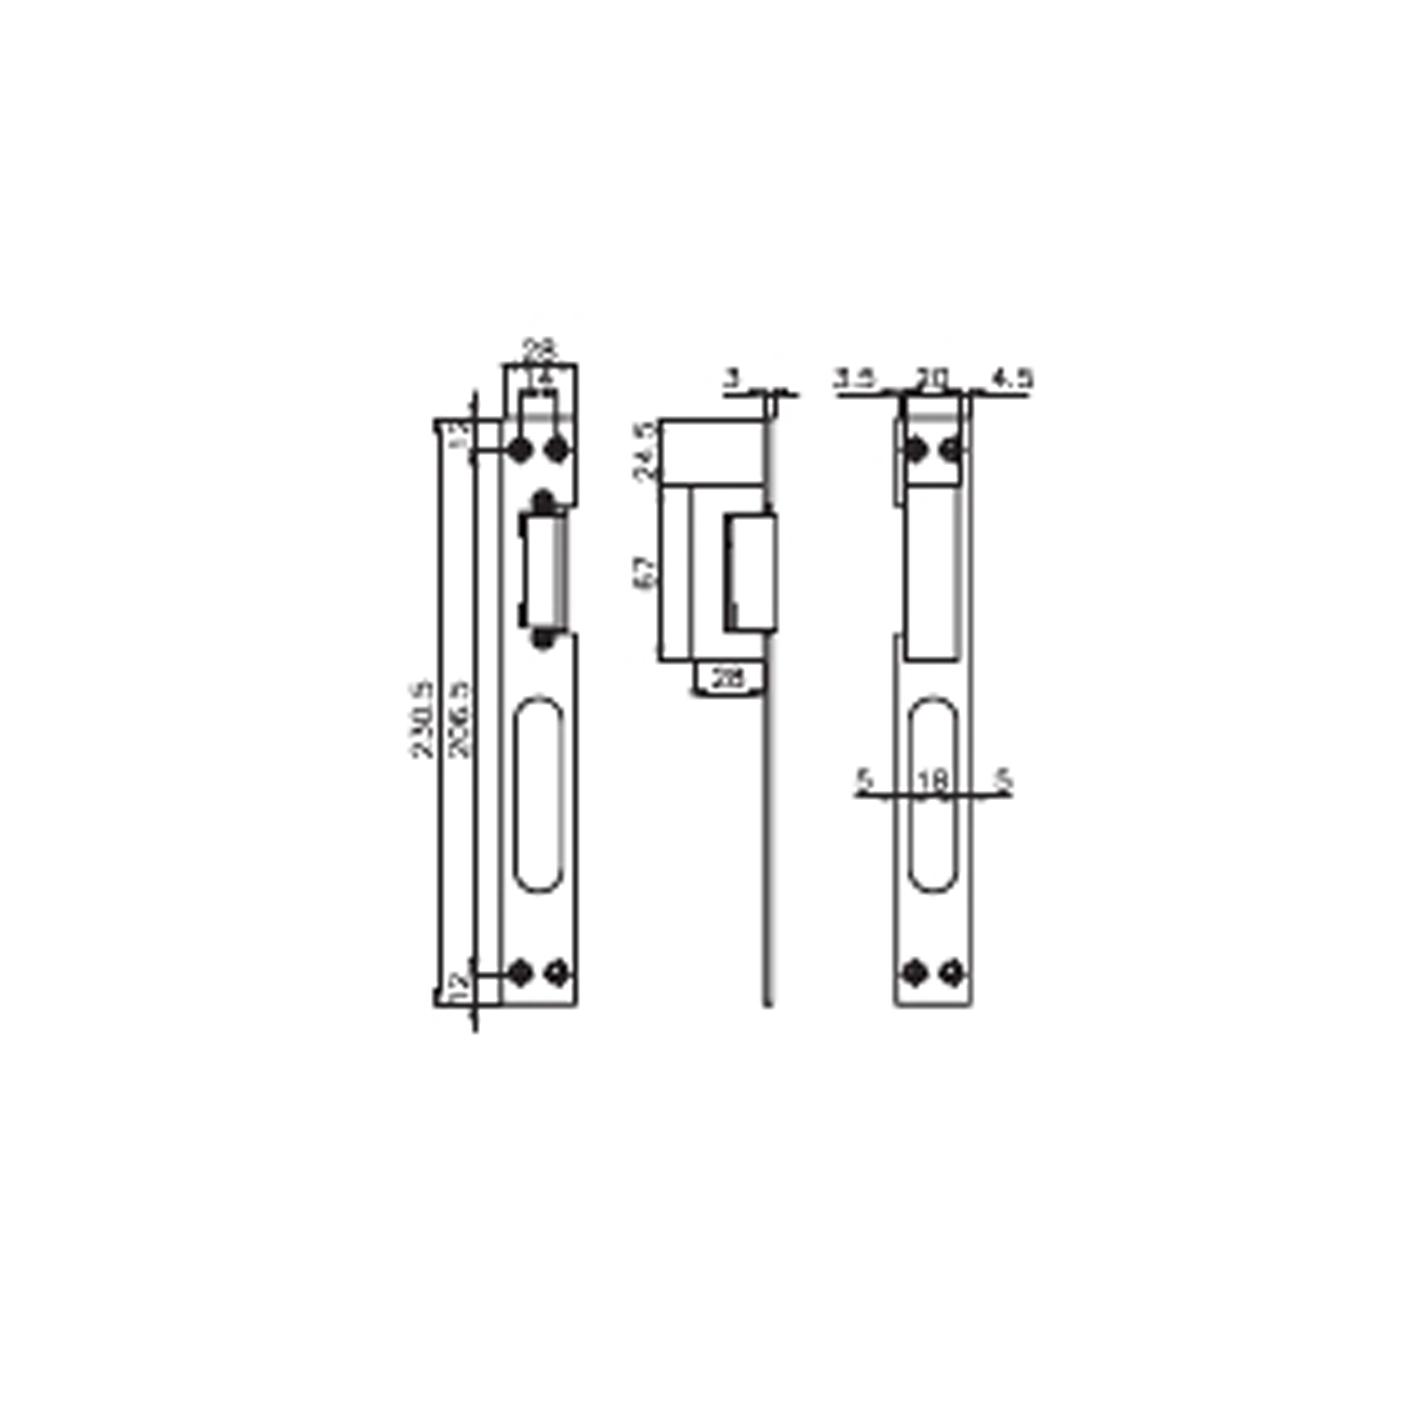 Kale KD012/20-125 Gizli Kapı Otomatiği